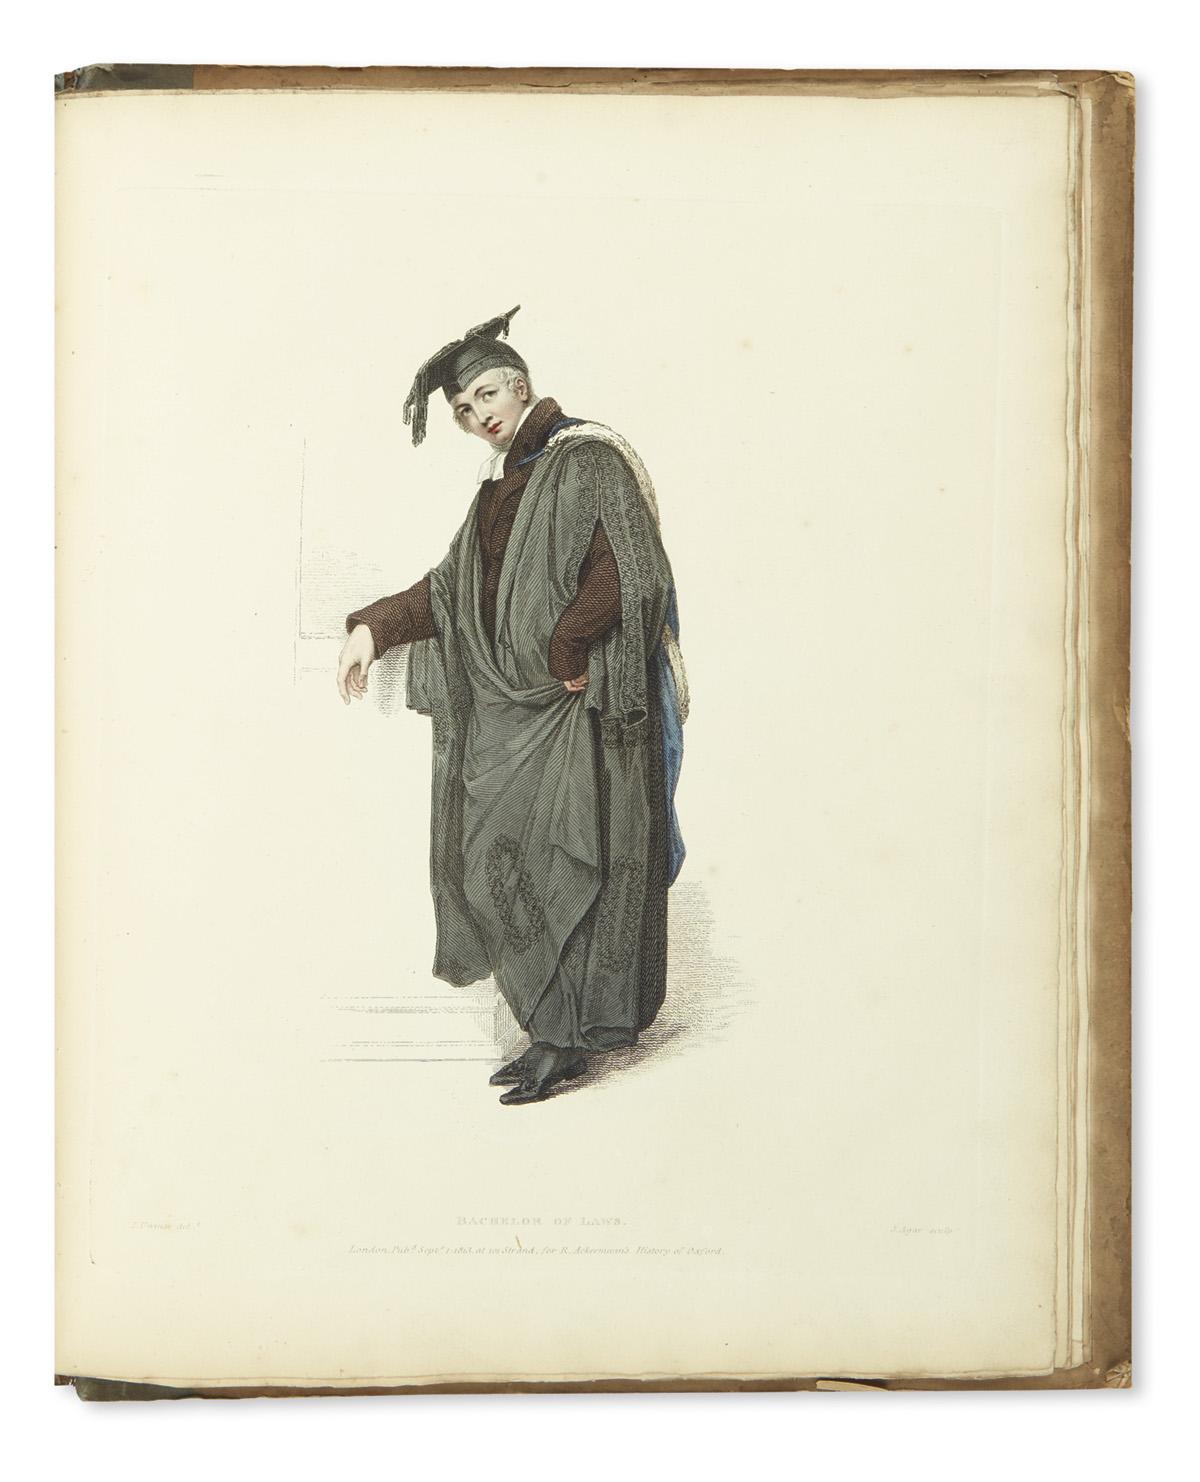 (COSTUME)-Uwins-Thomas-The-Costume-of-the-University-of-Oxfo